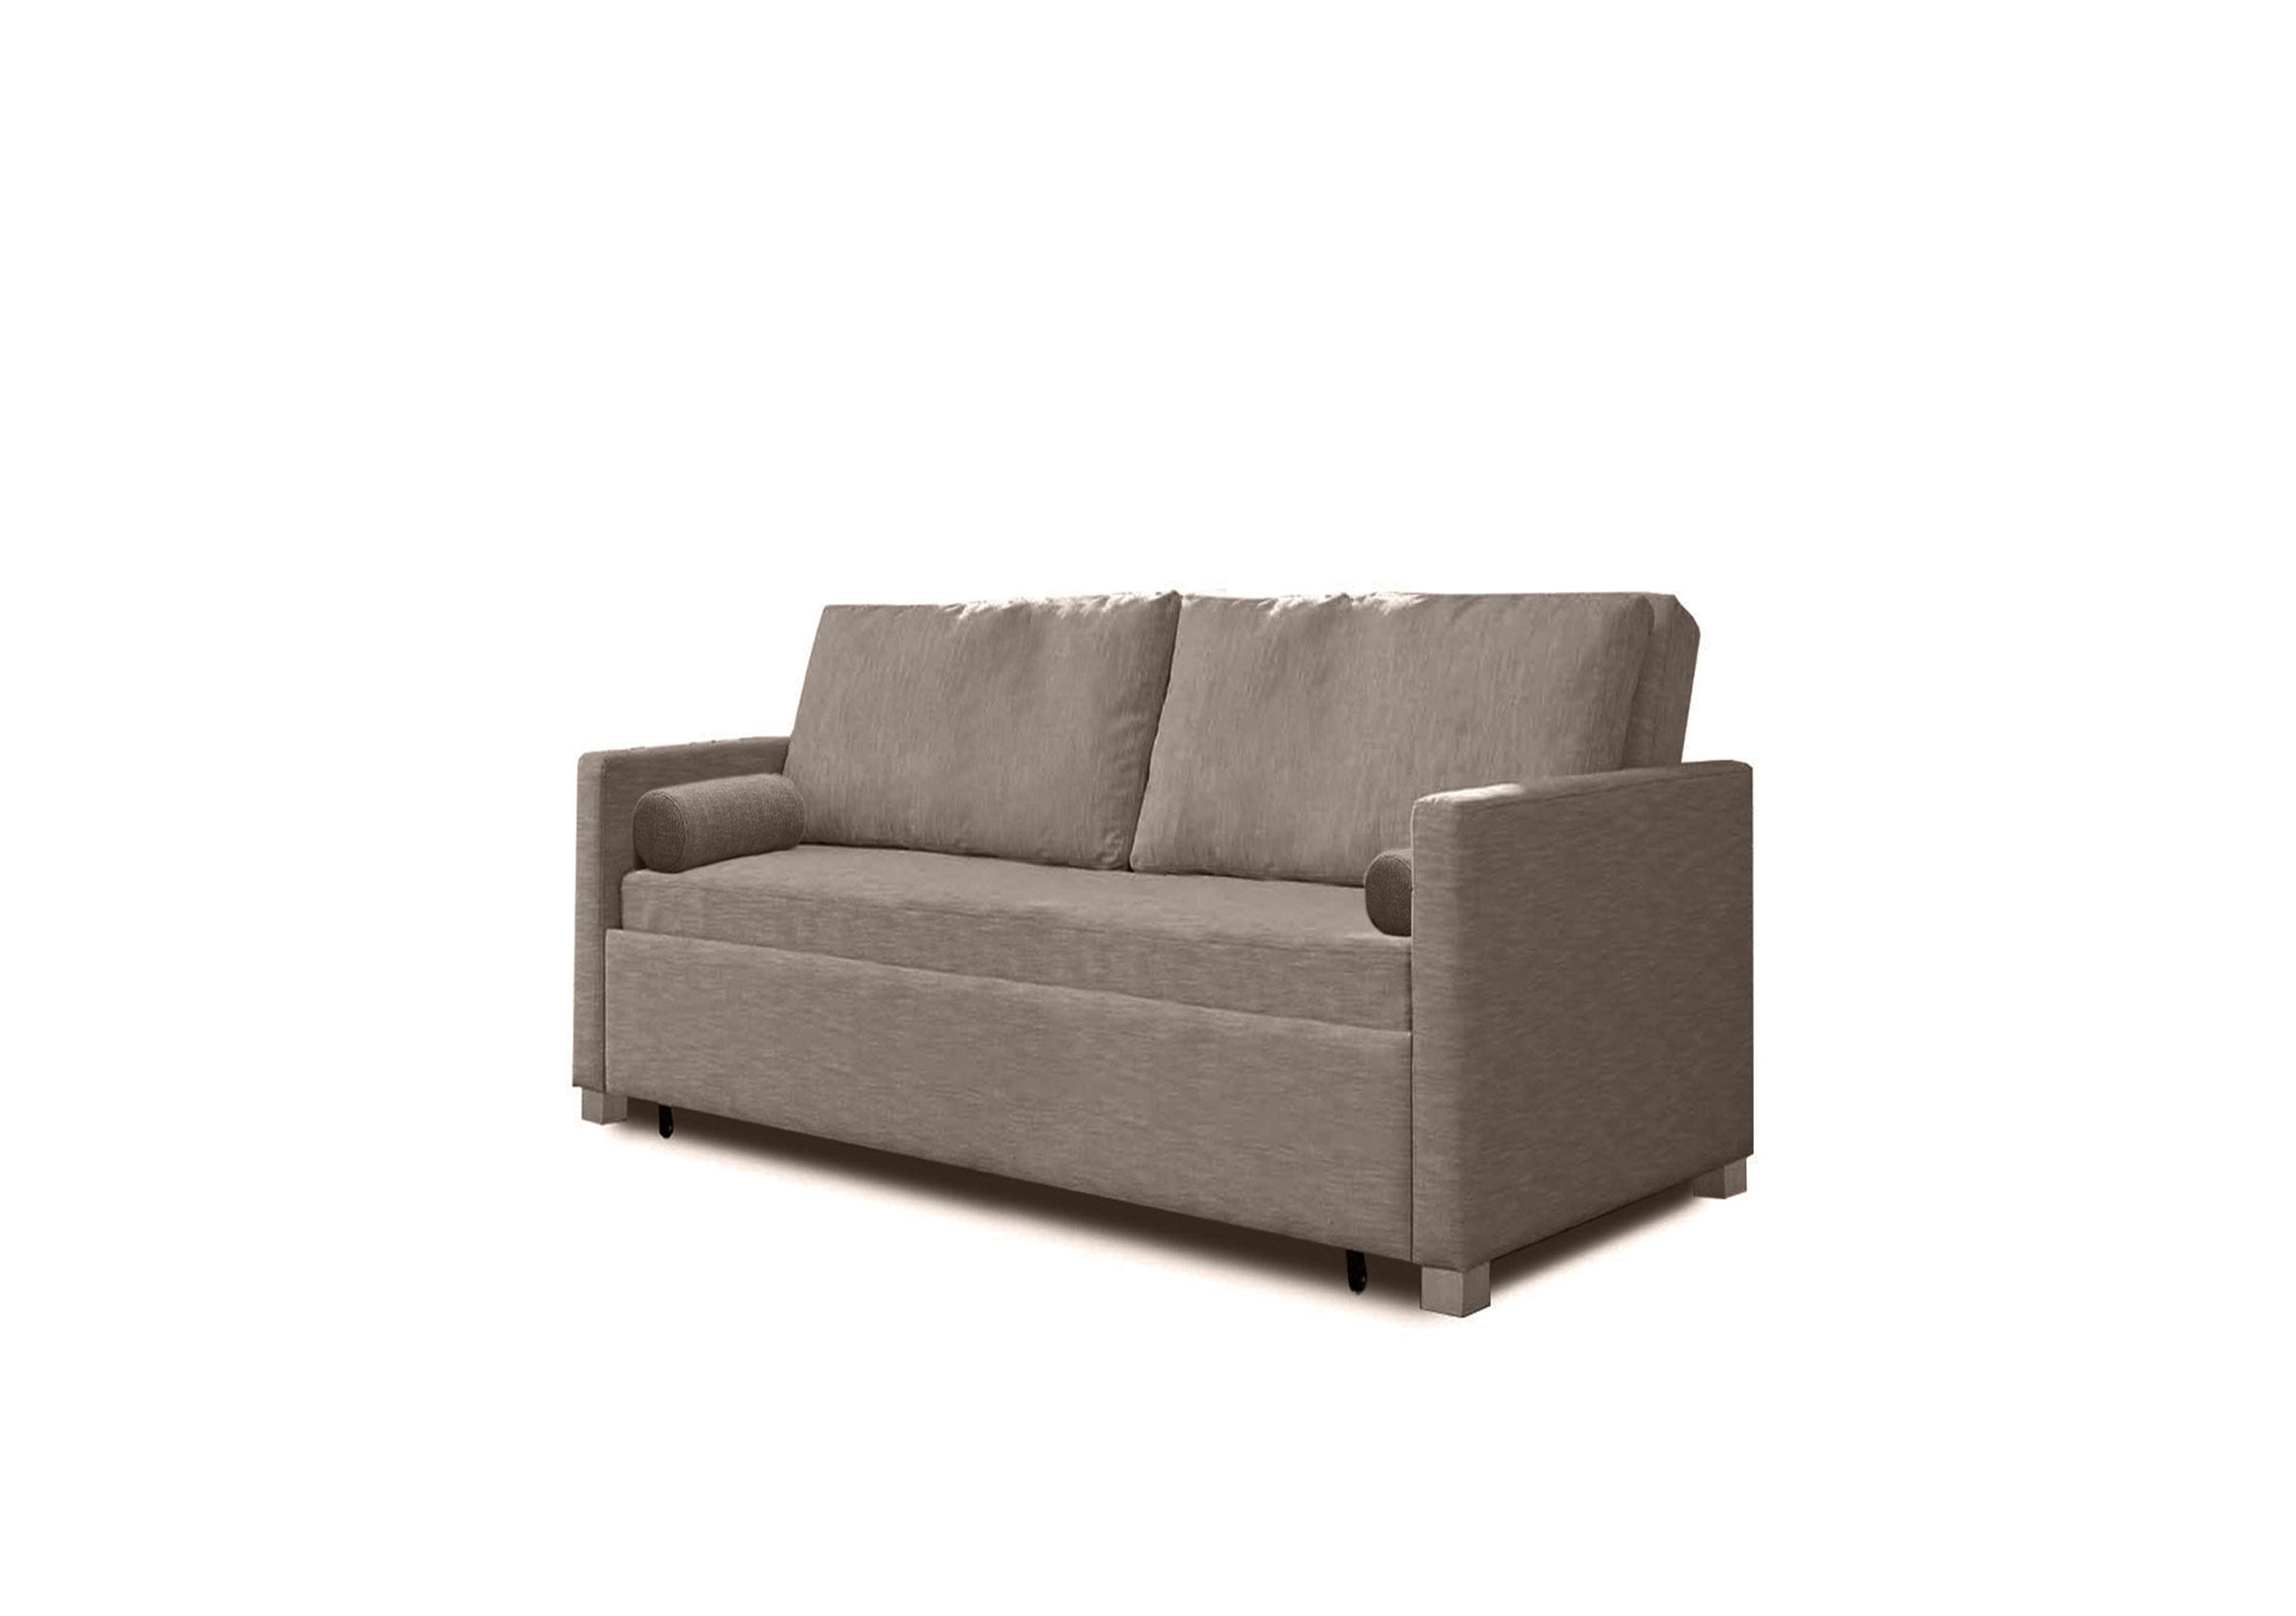 66 inch wide sofa beds las vegas nv harmony  queen size memory foam bed